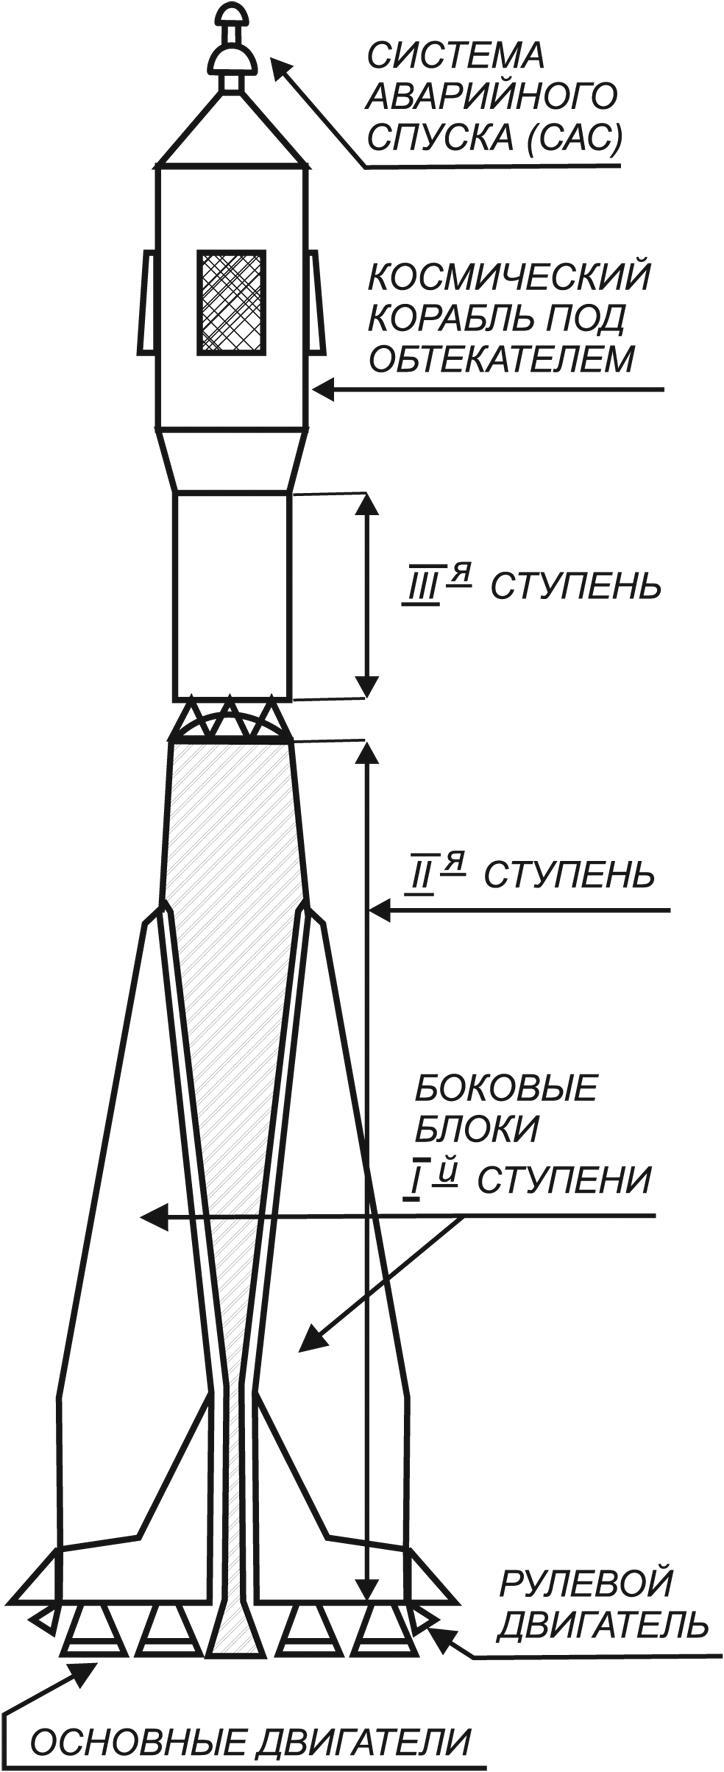 Картинка ракеты схема